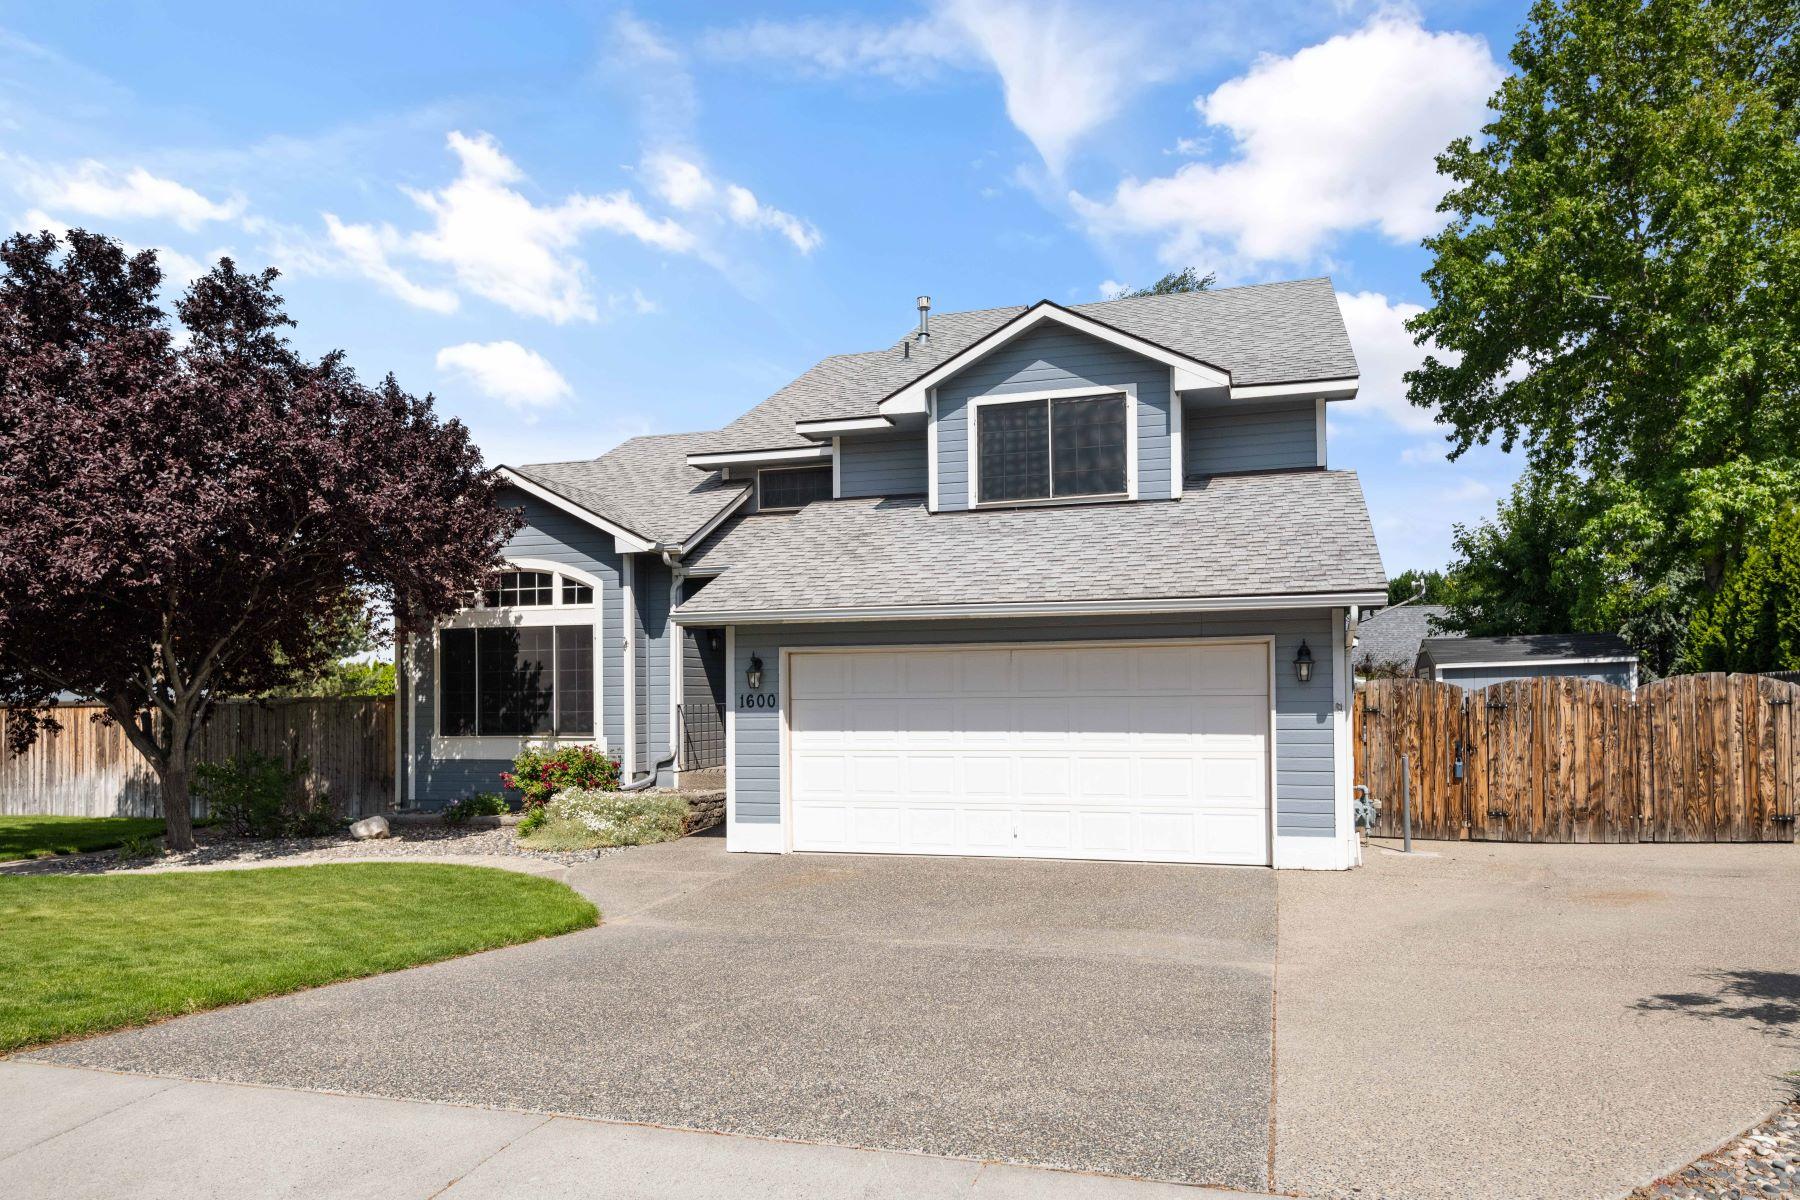 Single Family Homes for Sale at Beautiful home,amazing location,what a gem! 1600 Alamosa, Richland, Washington 9935 United States